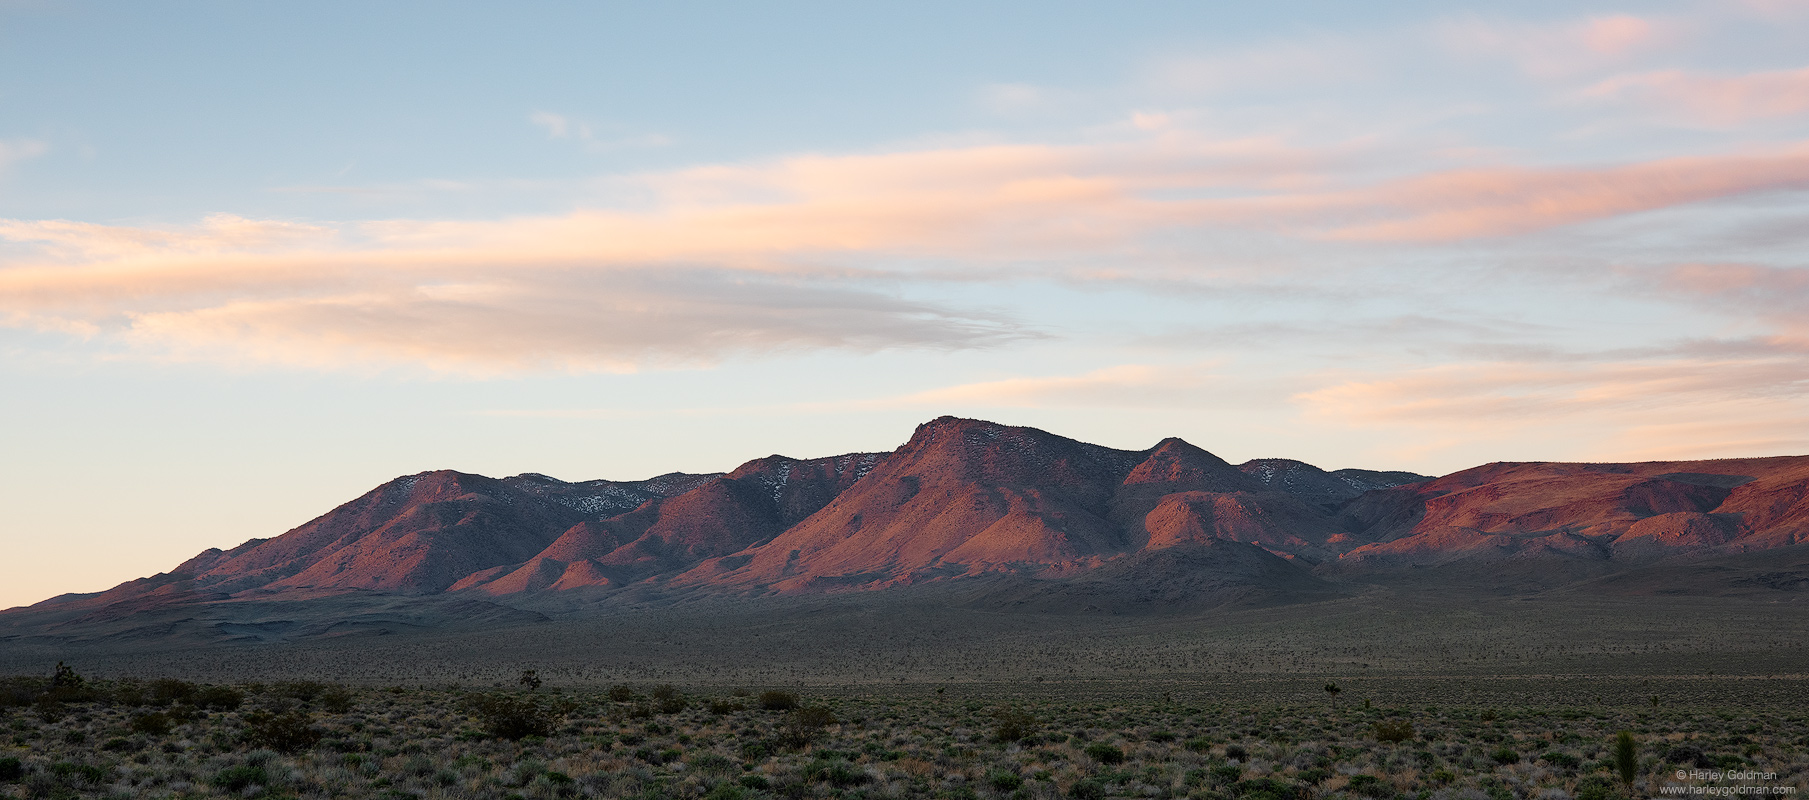 death valley, gentle, light, desert, cloud, clouds, mountain, sunrise, morning